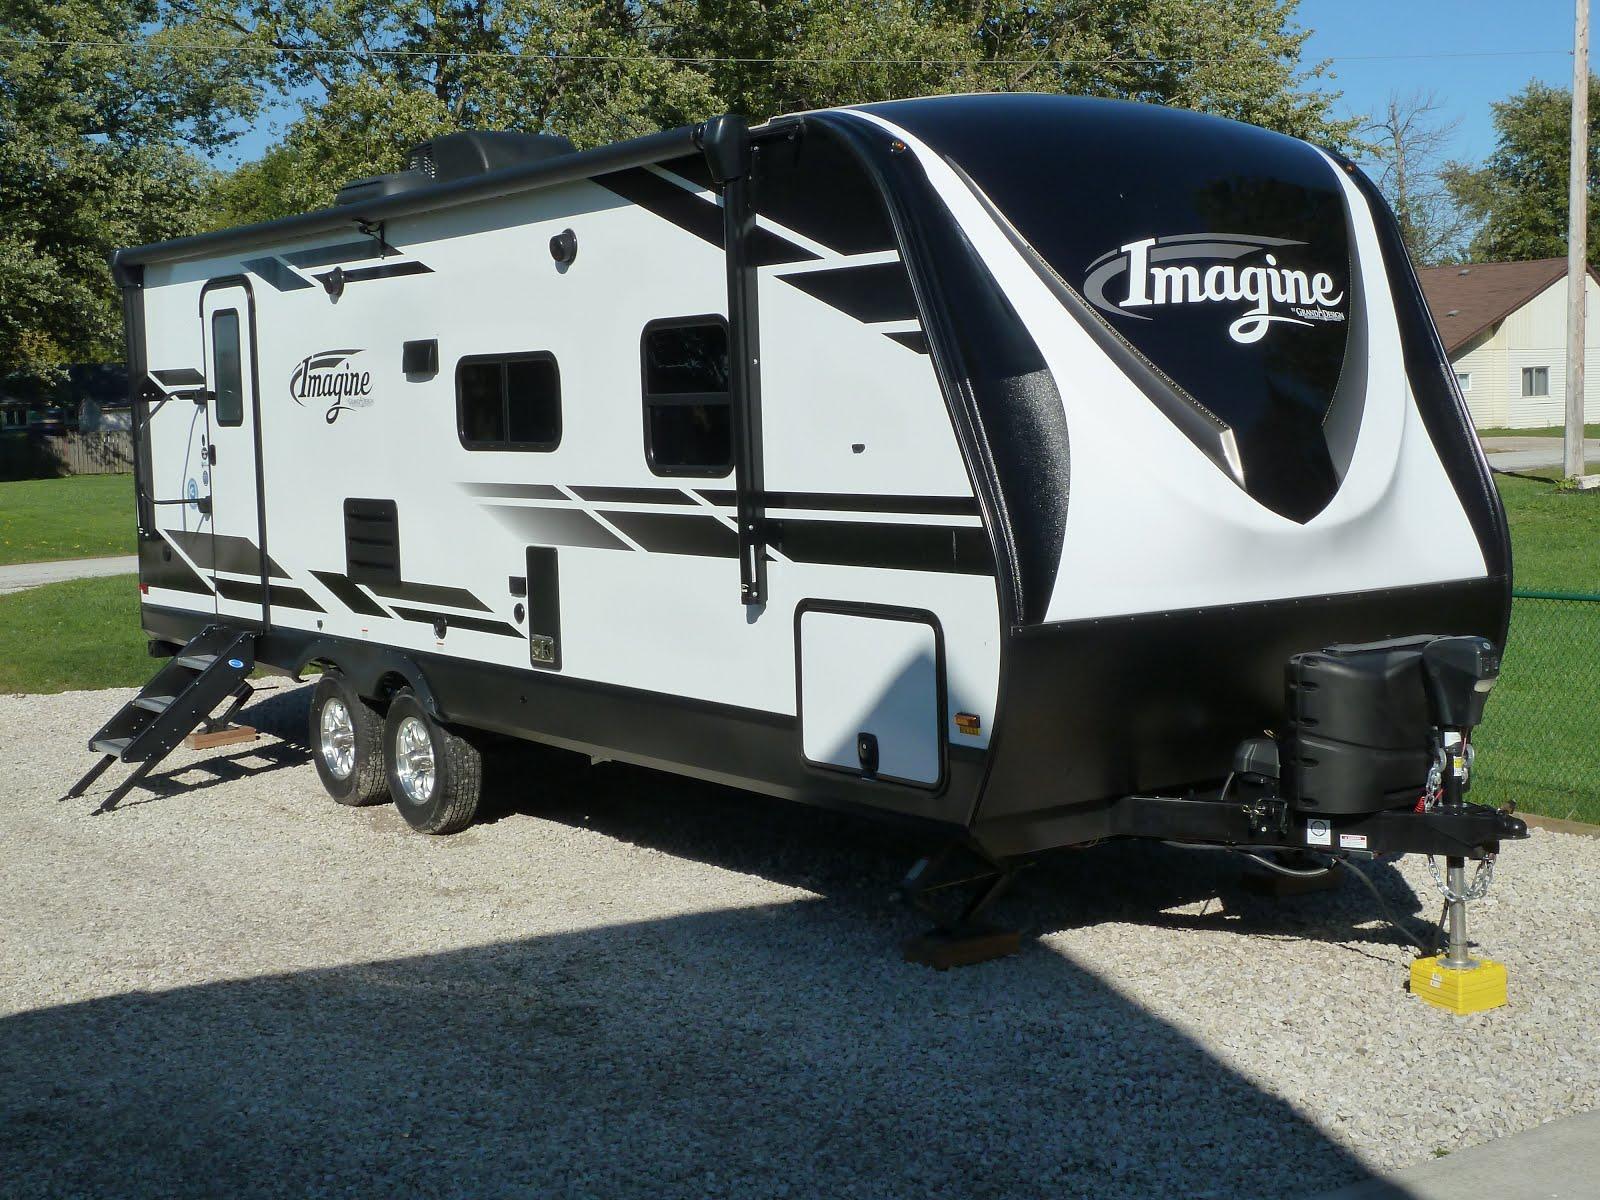 Our present camper